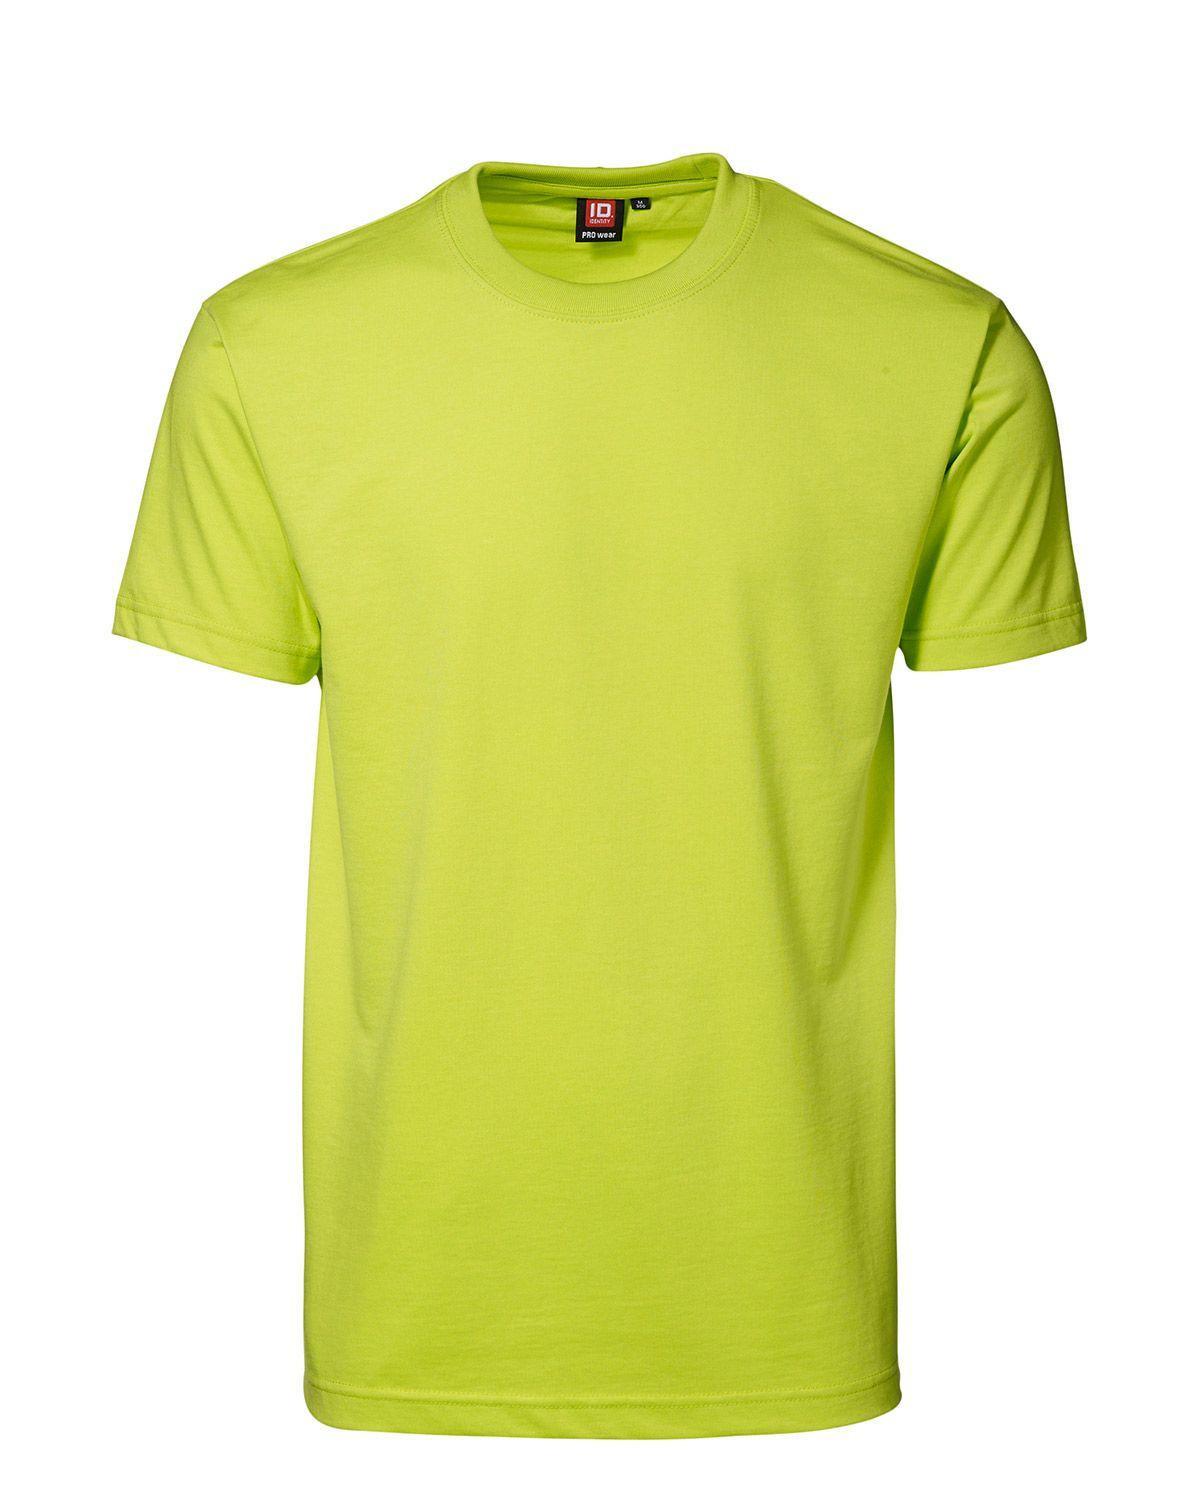 ID PRO Wear T-shirt för Herrar (Lime, XL)